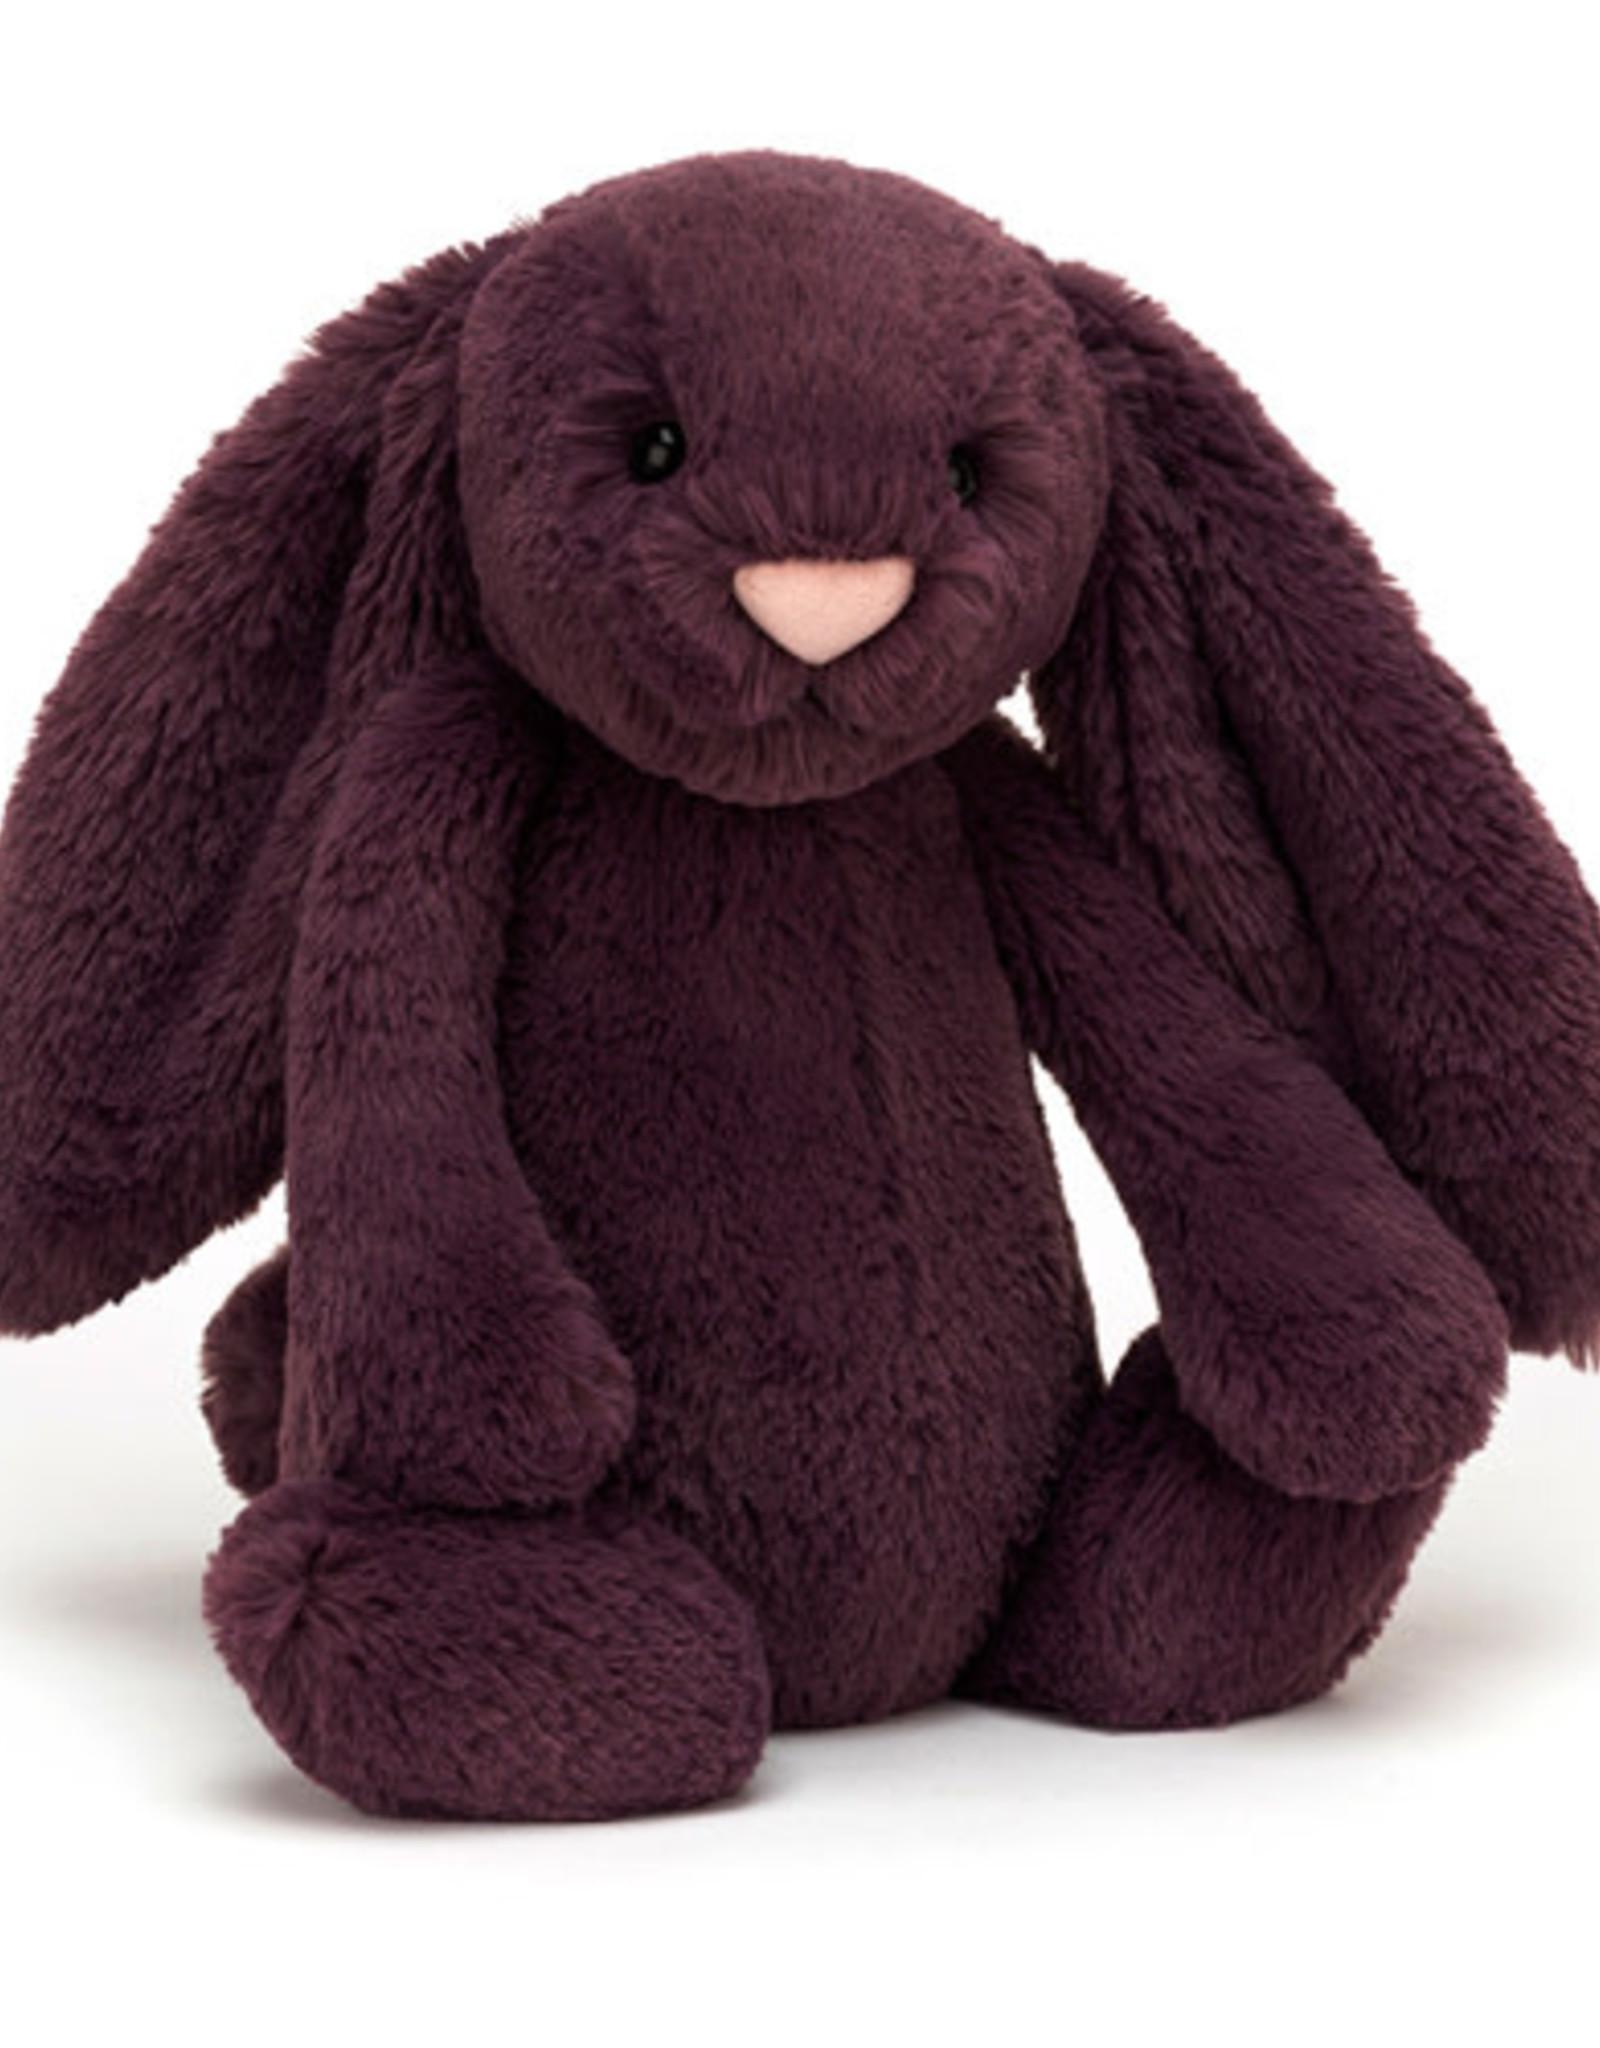 Jellycat Bashful Bunny Plum M